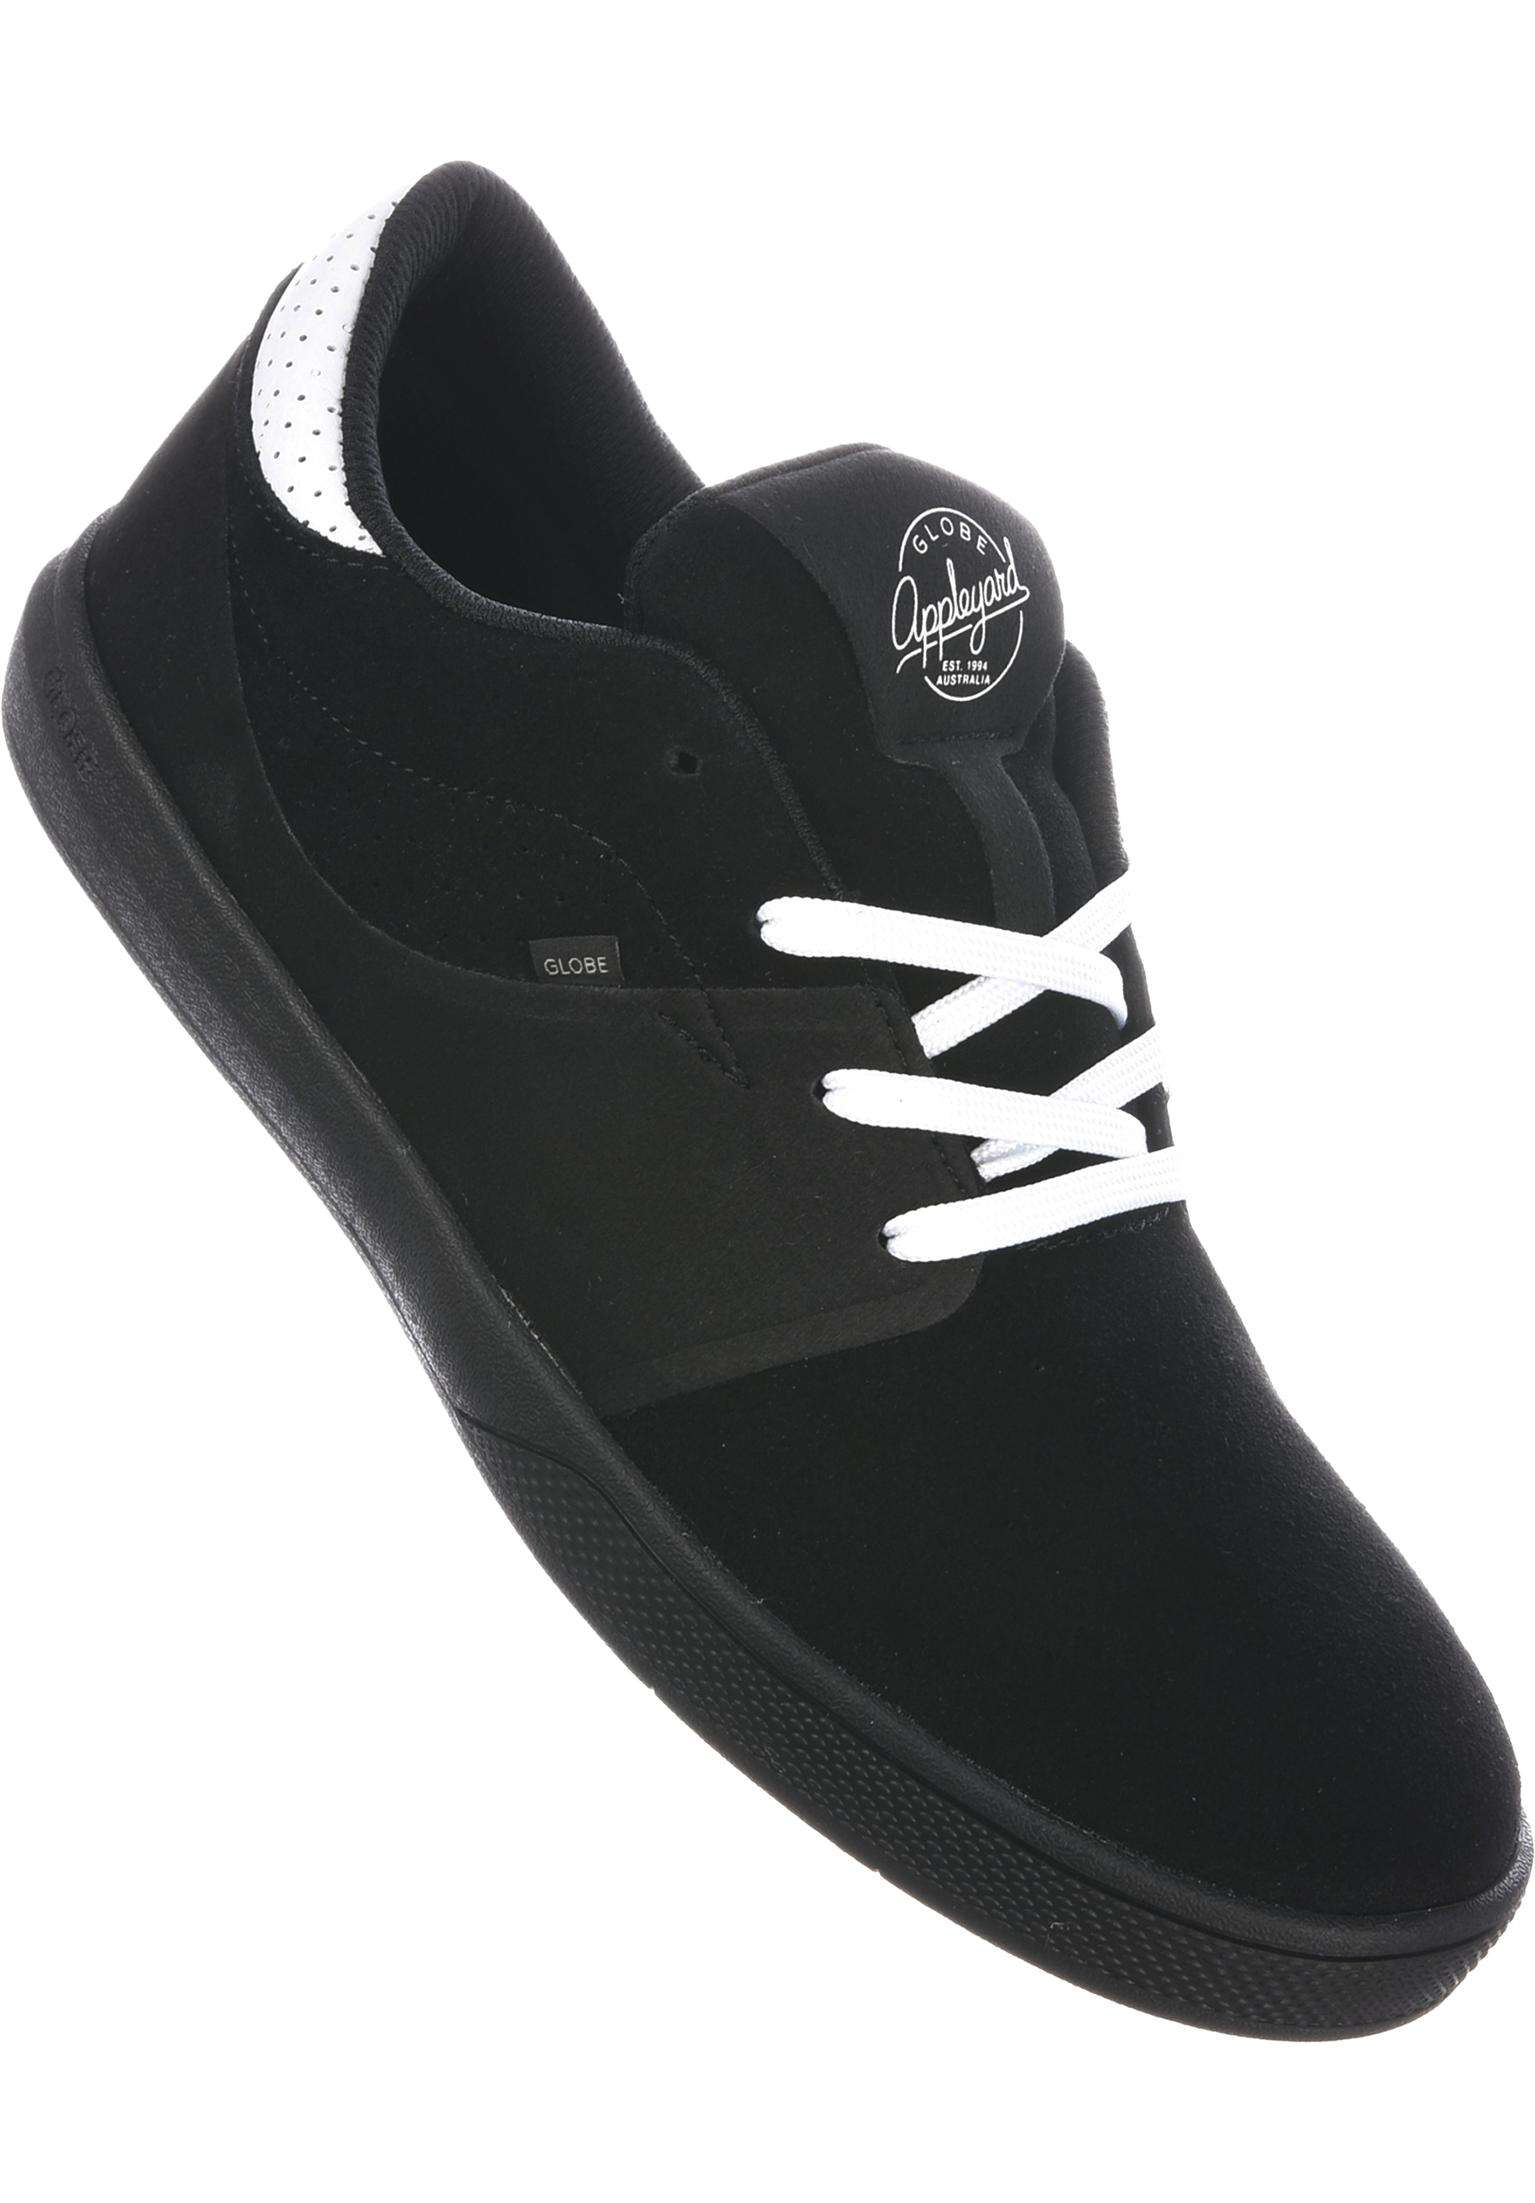 Mahalo SG Globe Alle Schuhe Schuhe Schuhe in schwarz gum für Herren   Titus a818a1